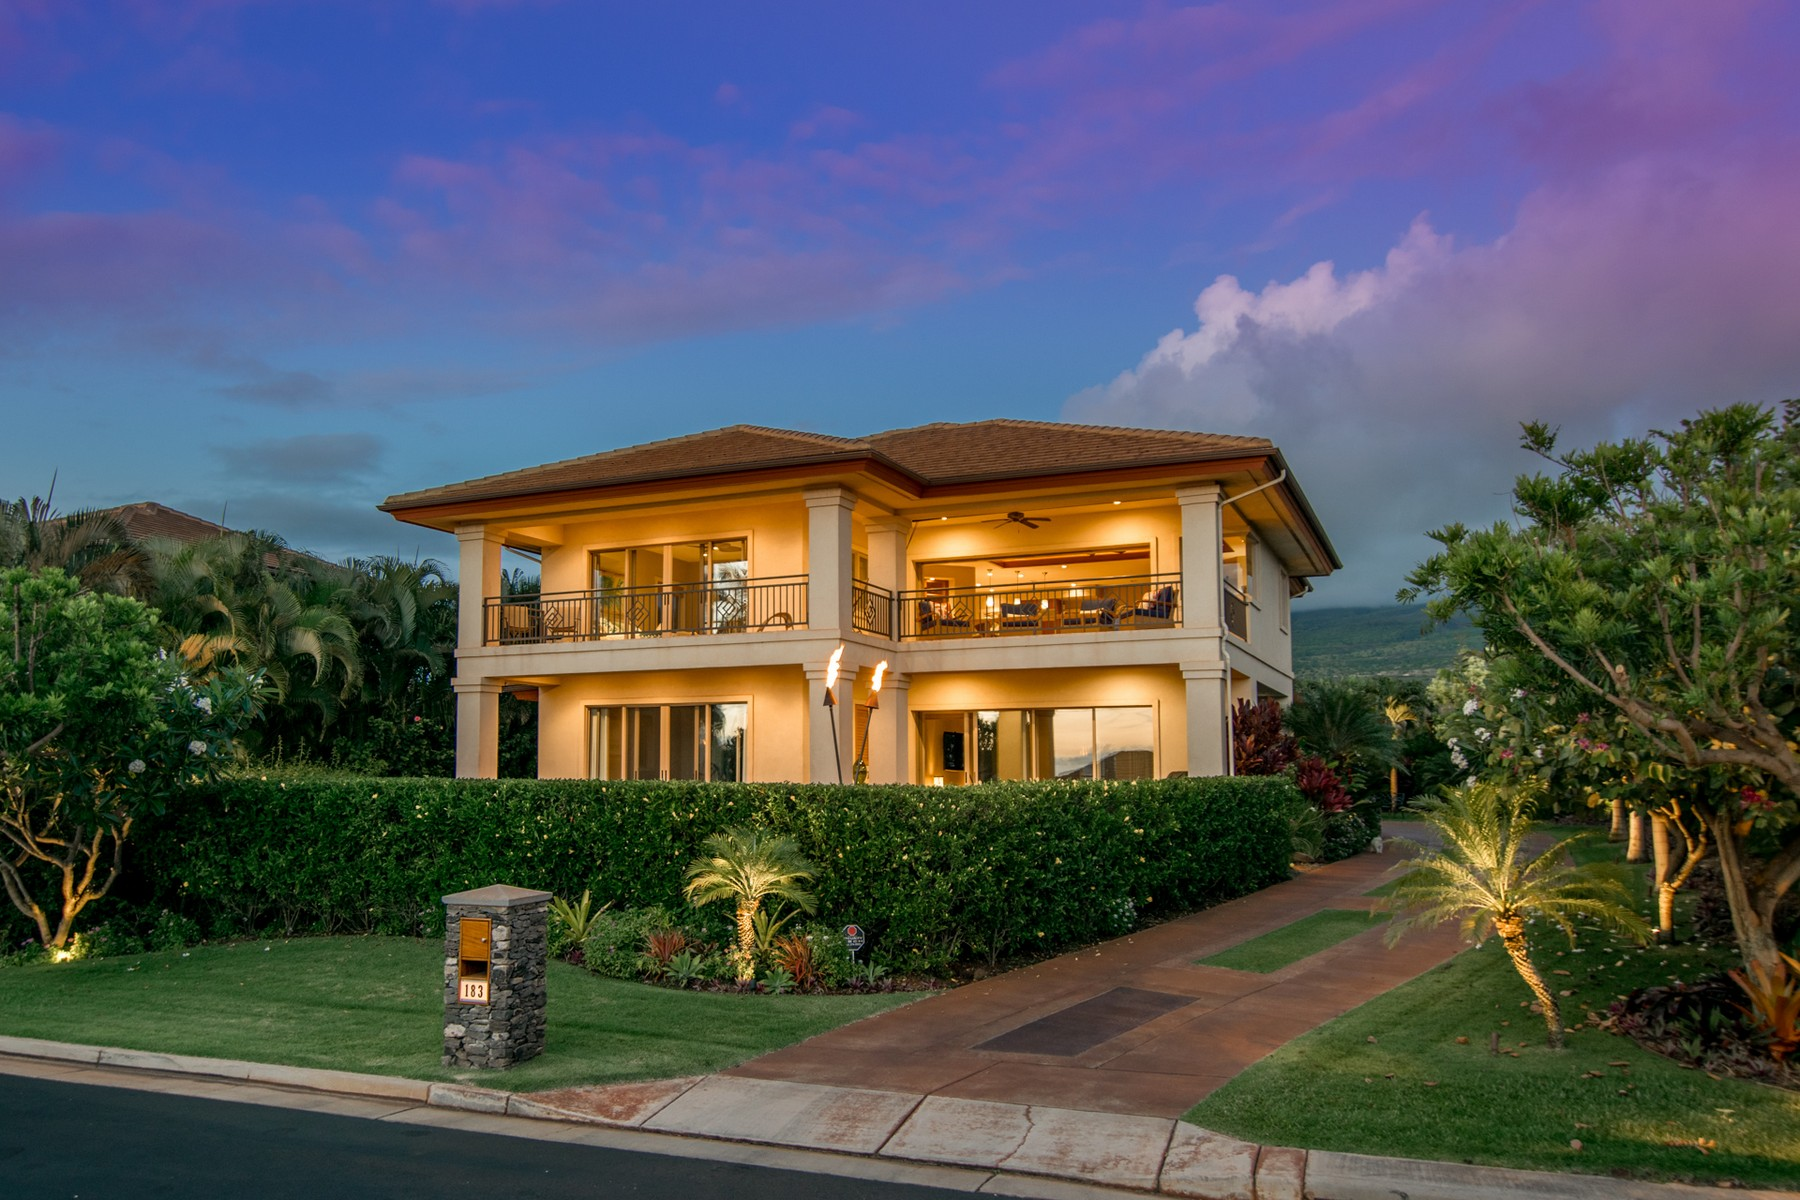 Tek Ailelik Ev için Satış at A Touch of Modern at Kaanapali Summit 183 Welau Way Lahaina, Hawaii, 96761 Amerika Birleşik Devletleri